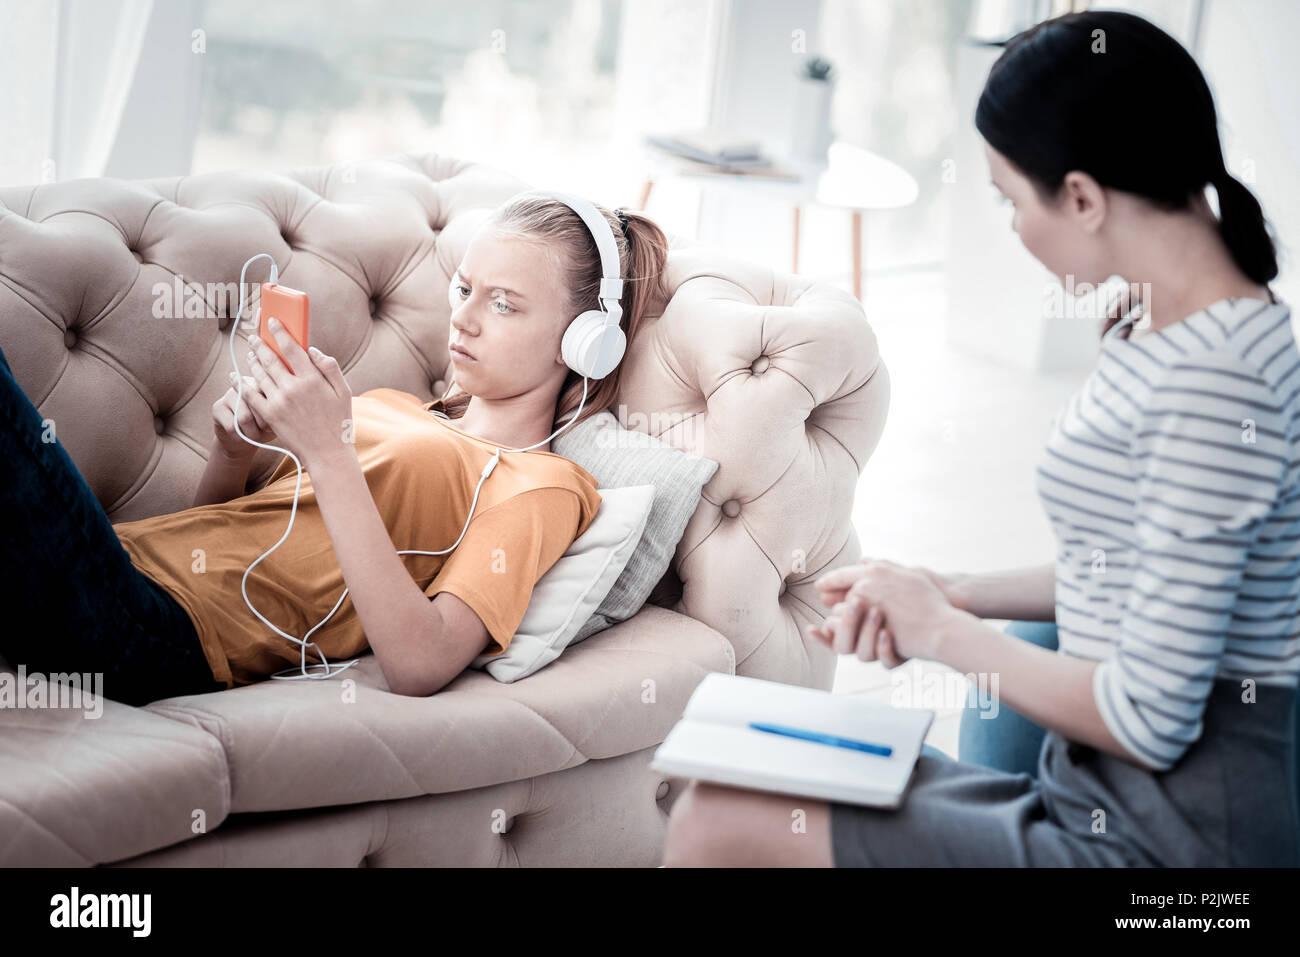 Upset girl listening to music during attending psychologist - Stock Image